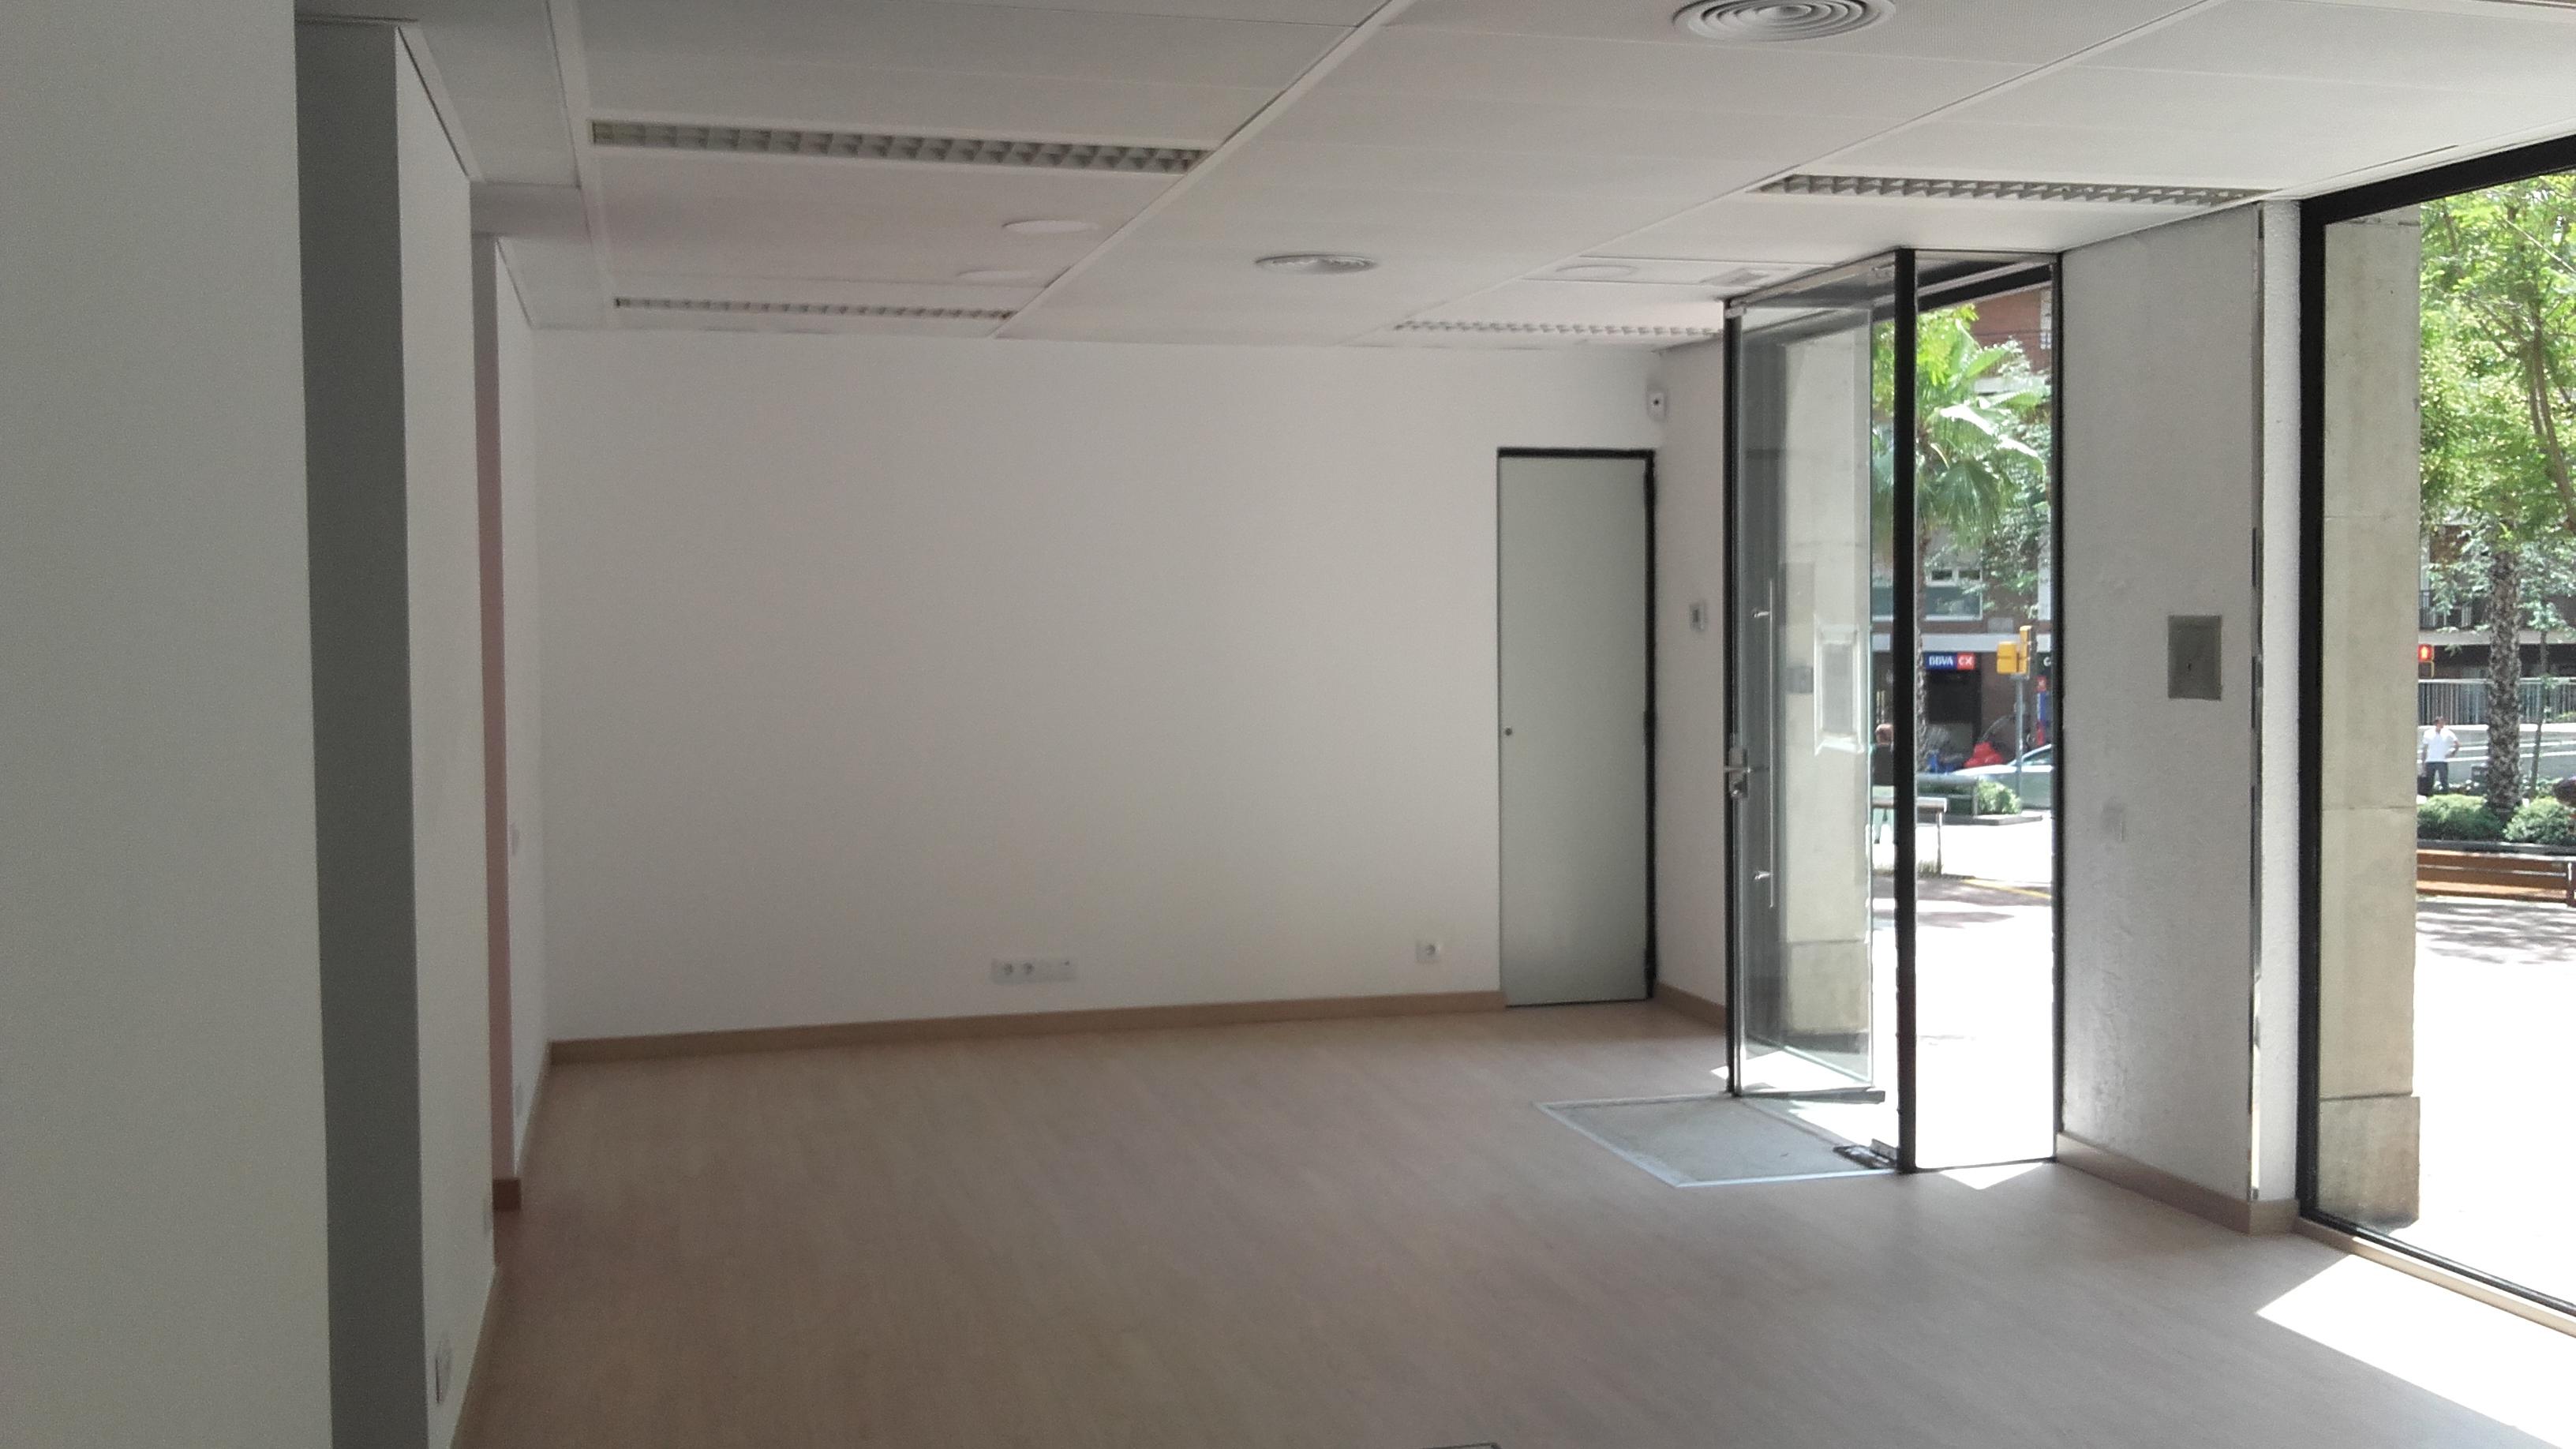 Reforma integral de local para oficina inmobiliaria acabados obra